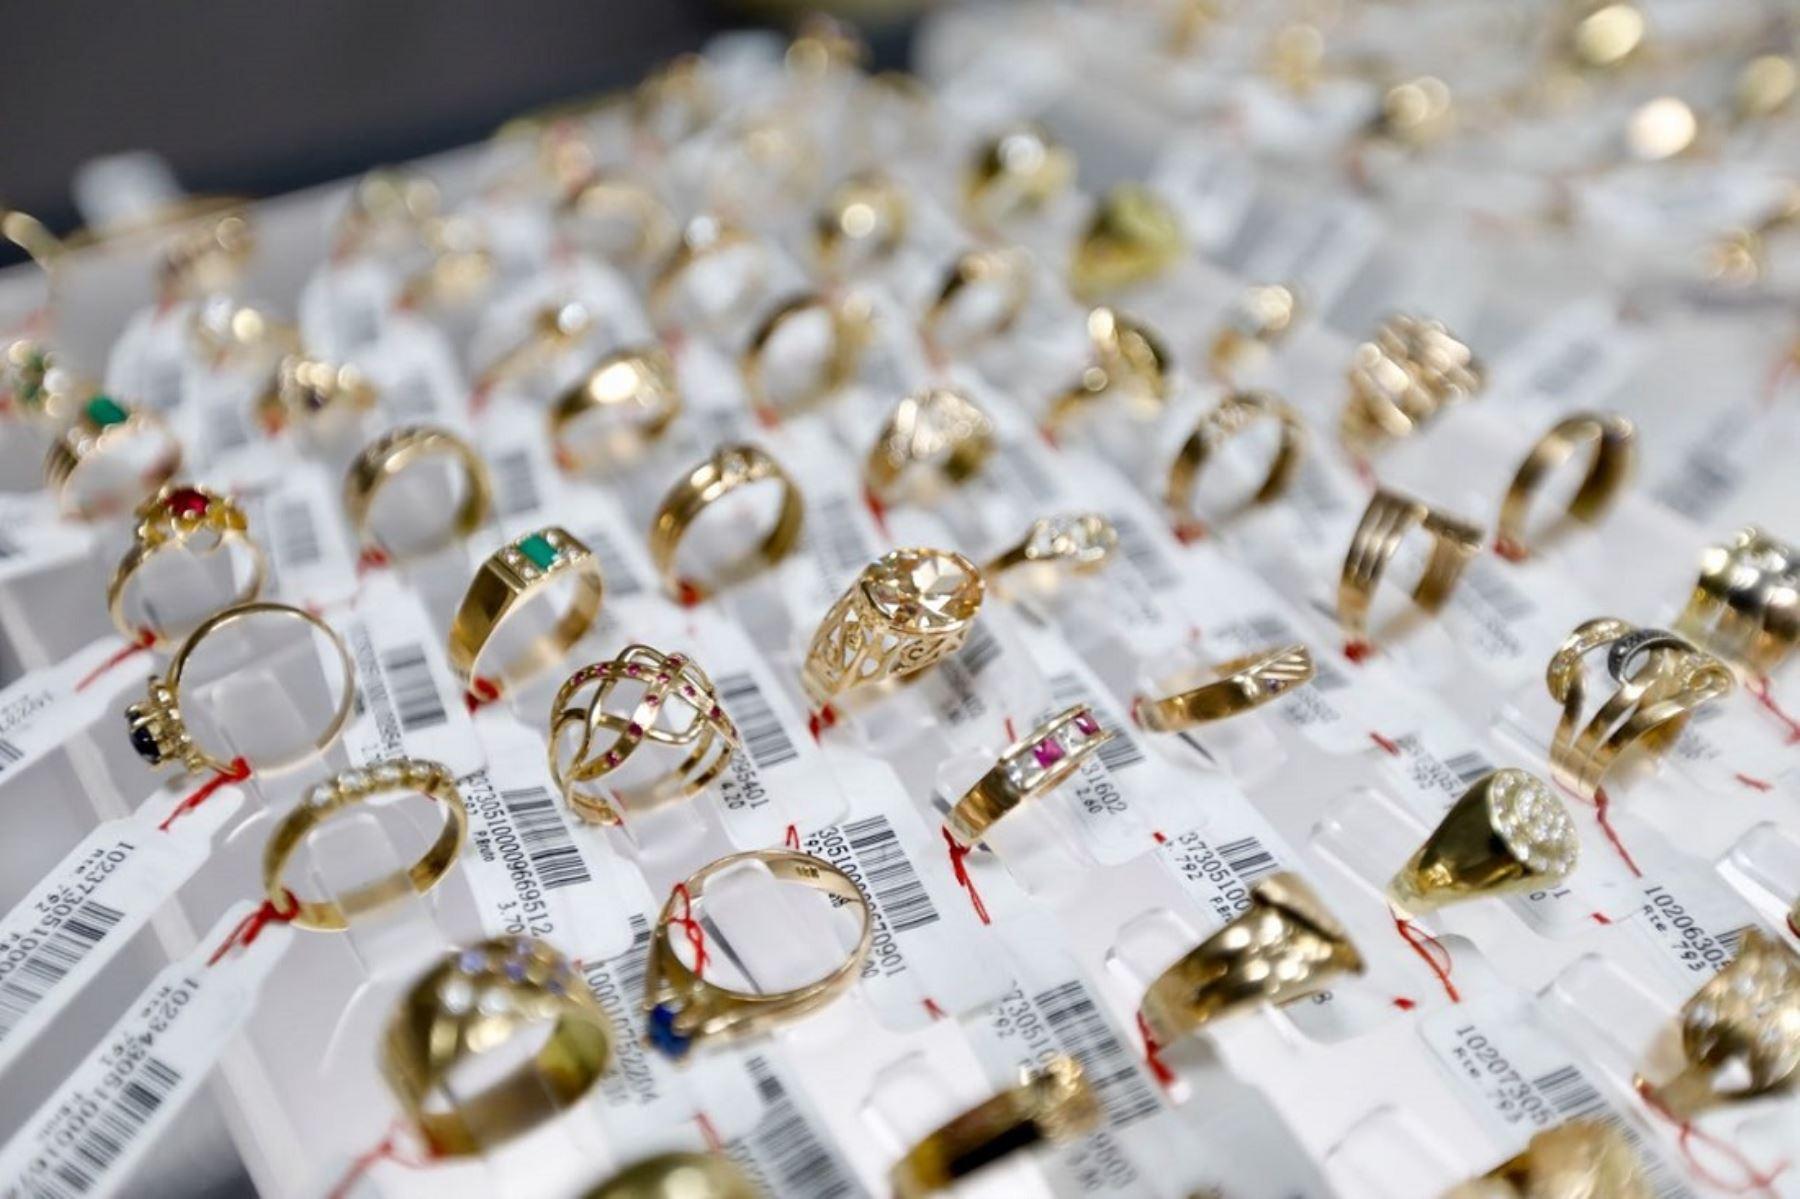 Caja Metropolitana pondrá a la venta joyas de oro. Foto: Difusión.